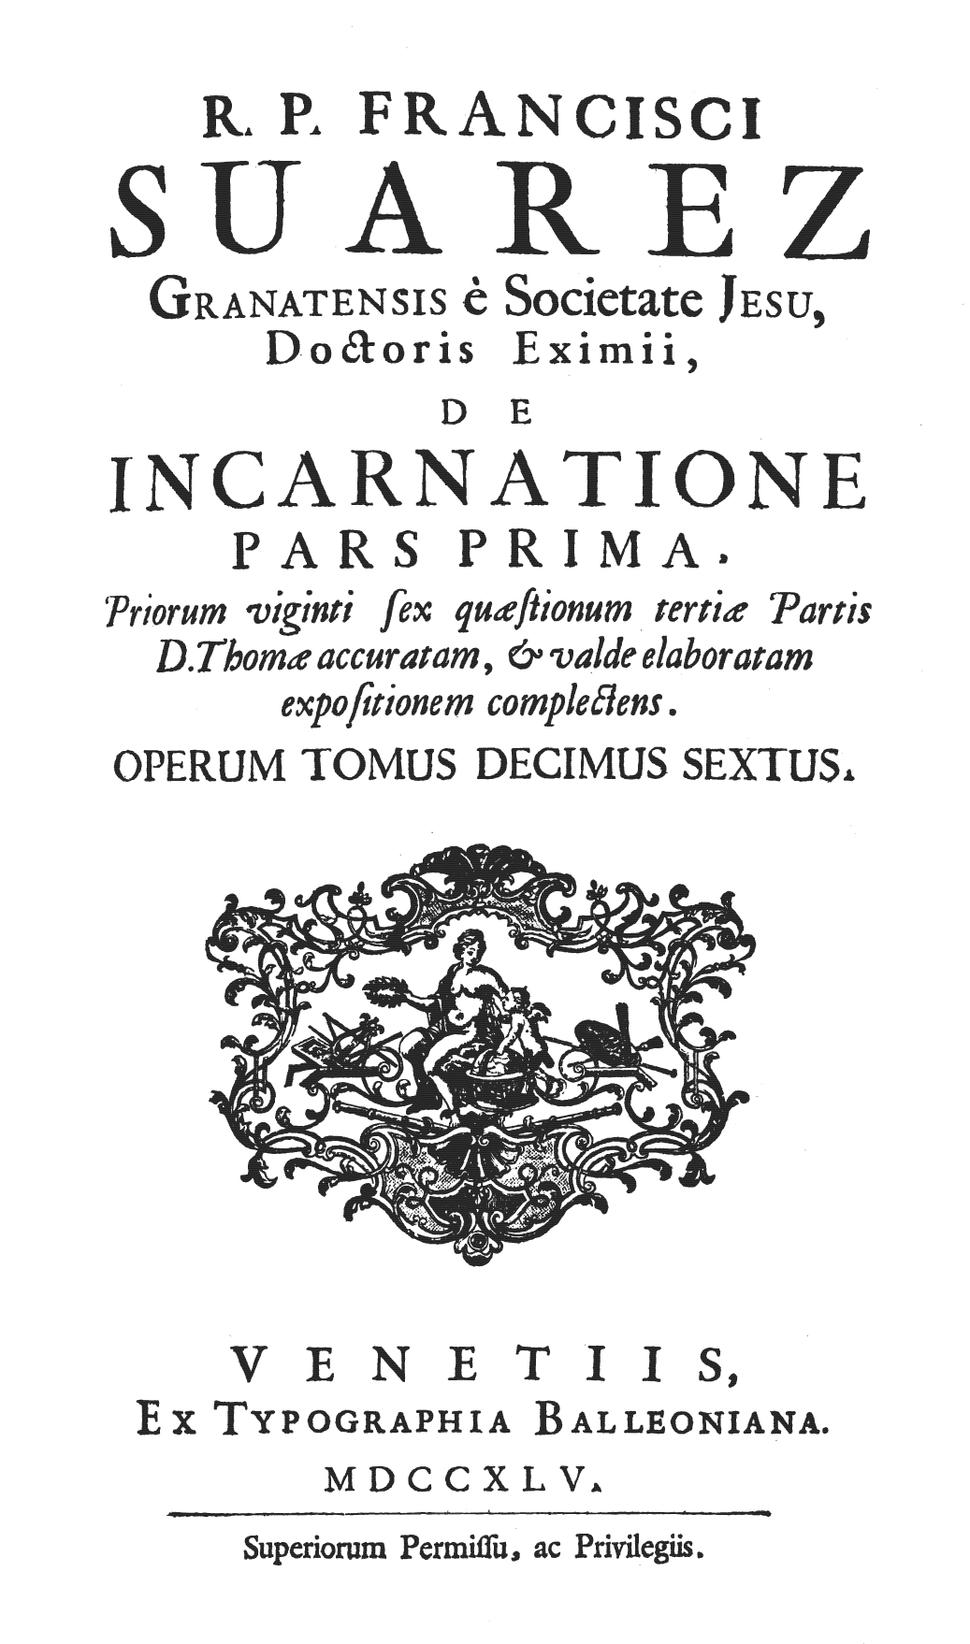 Francisco Suarez (1745) De incarnatione, pars 1